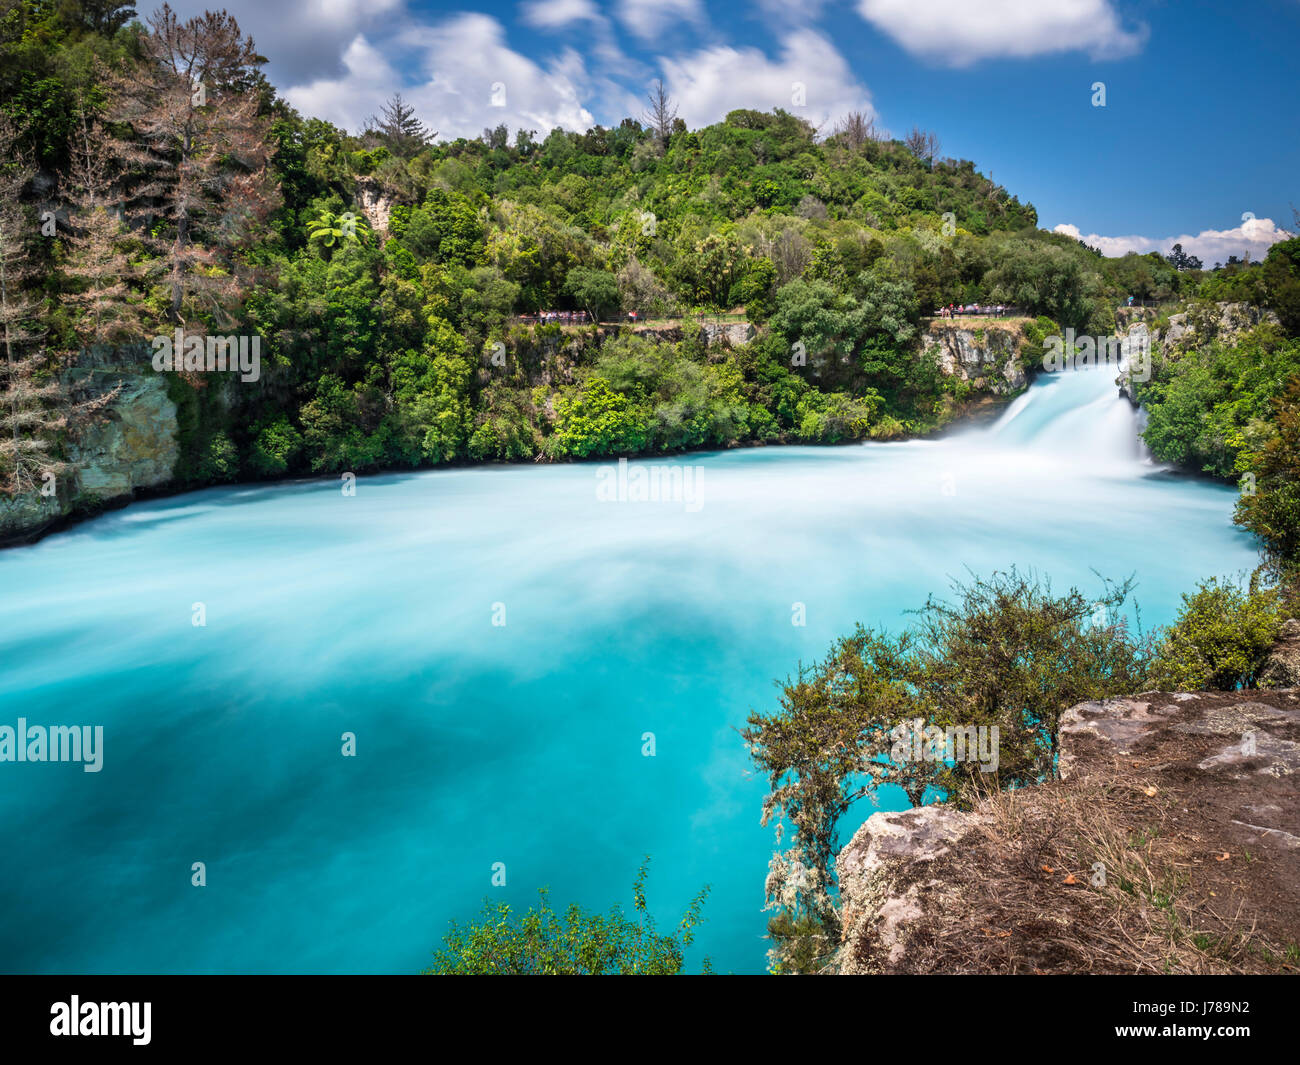 New Zealand, Taupo District, Waikato River, Huka Falls - Stock Image